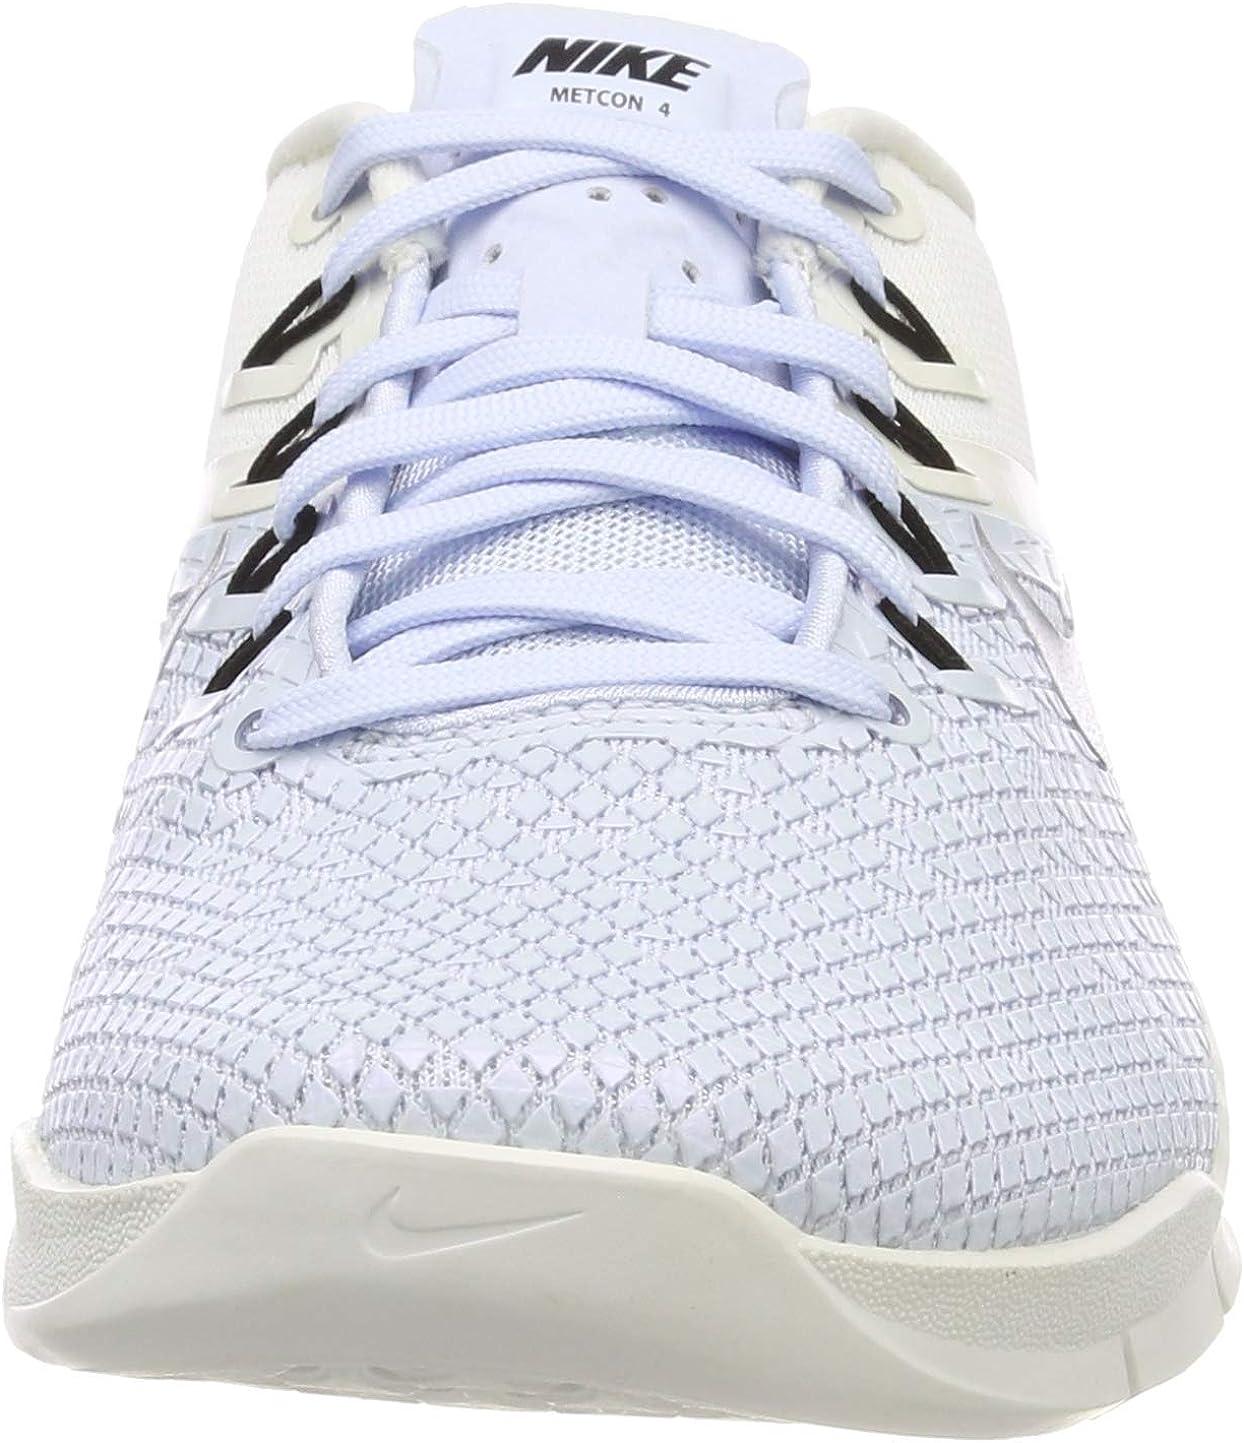 Metcon 4 XD Metallic Training Shoe